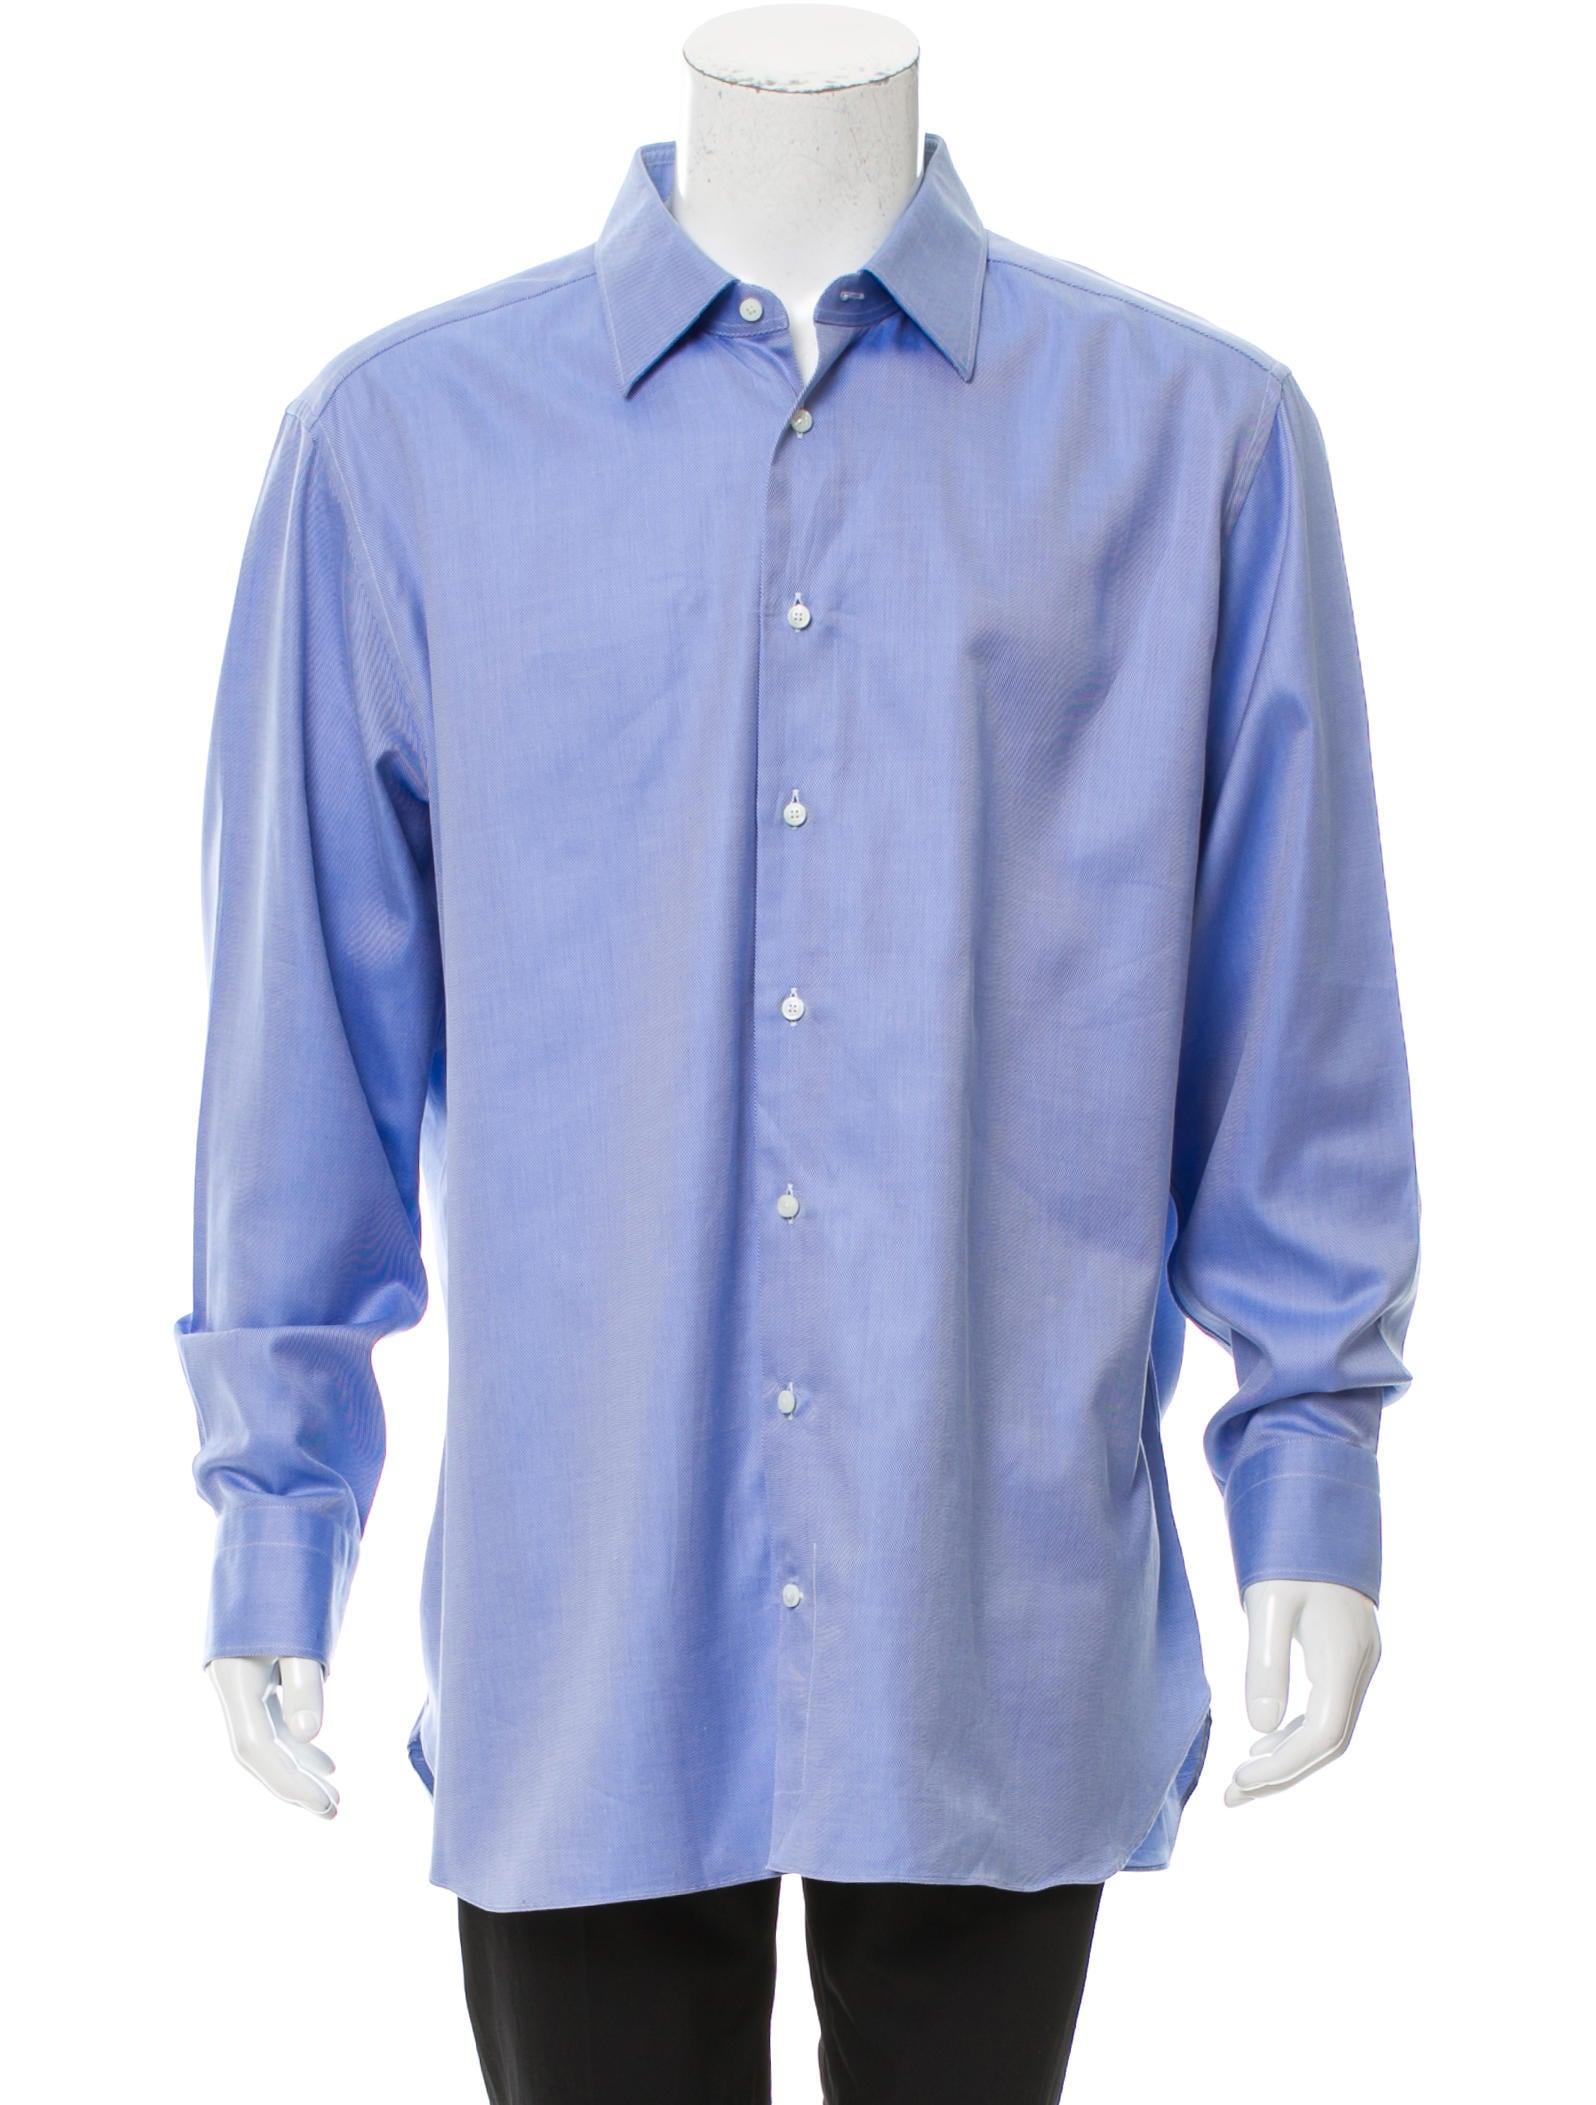 ermenegildo zegna su misura button up shirt clothing zgn25214 the realreal. Black Bedroom Furniture Sets. Home Design Ideas